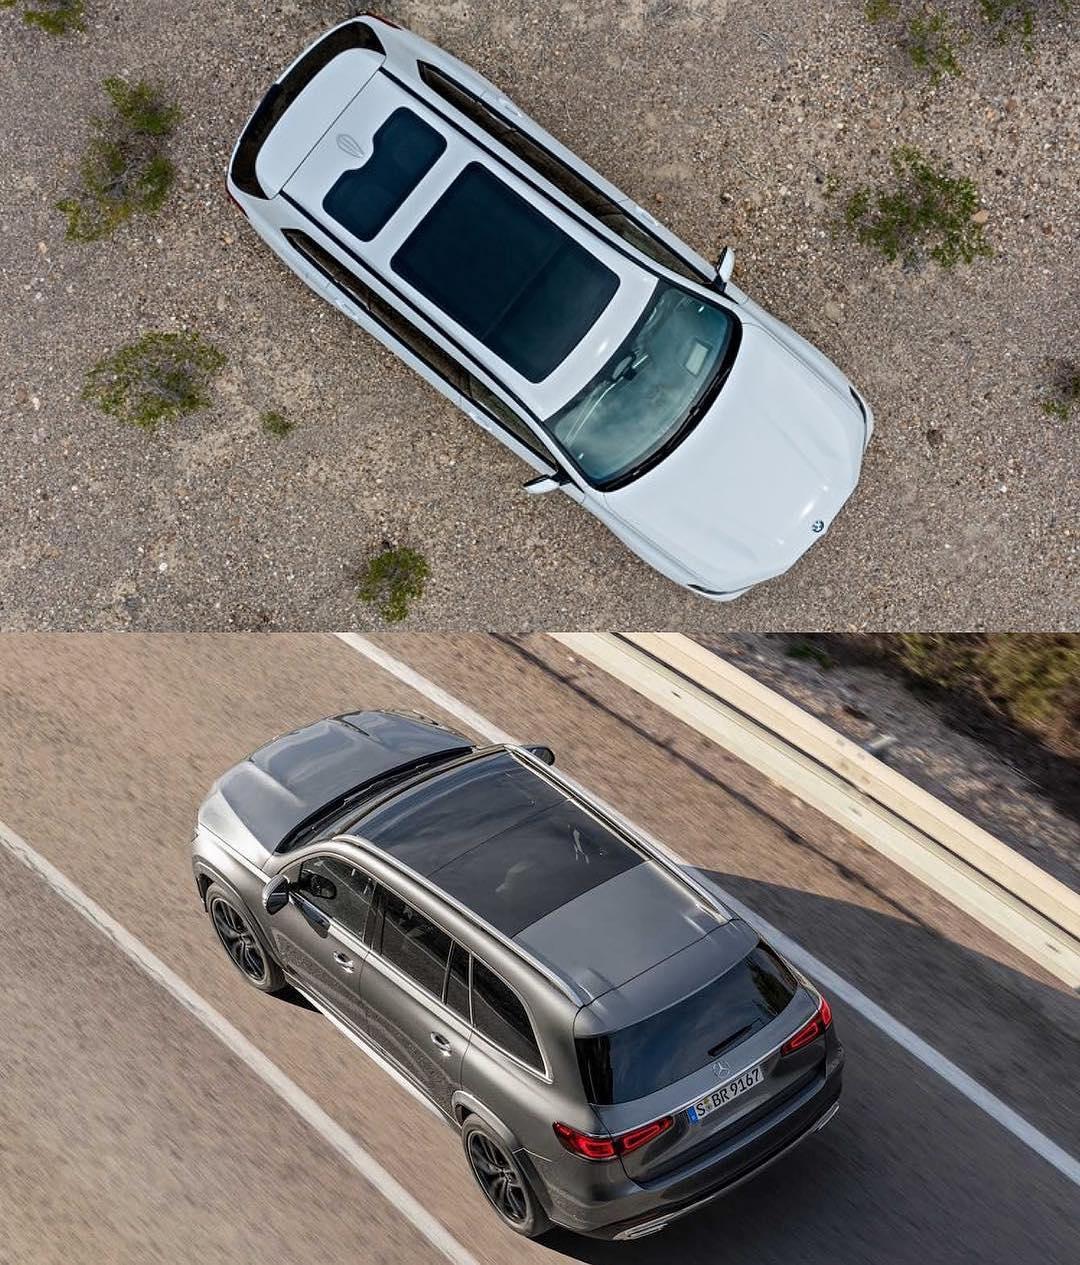 2020 Mercedes-Benz GLS-Class Vs. BMW X7: Big Luxury SUV